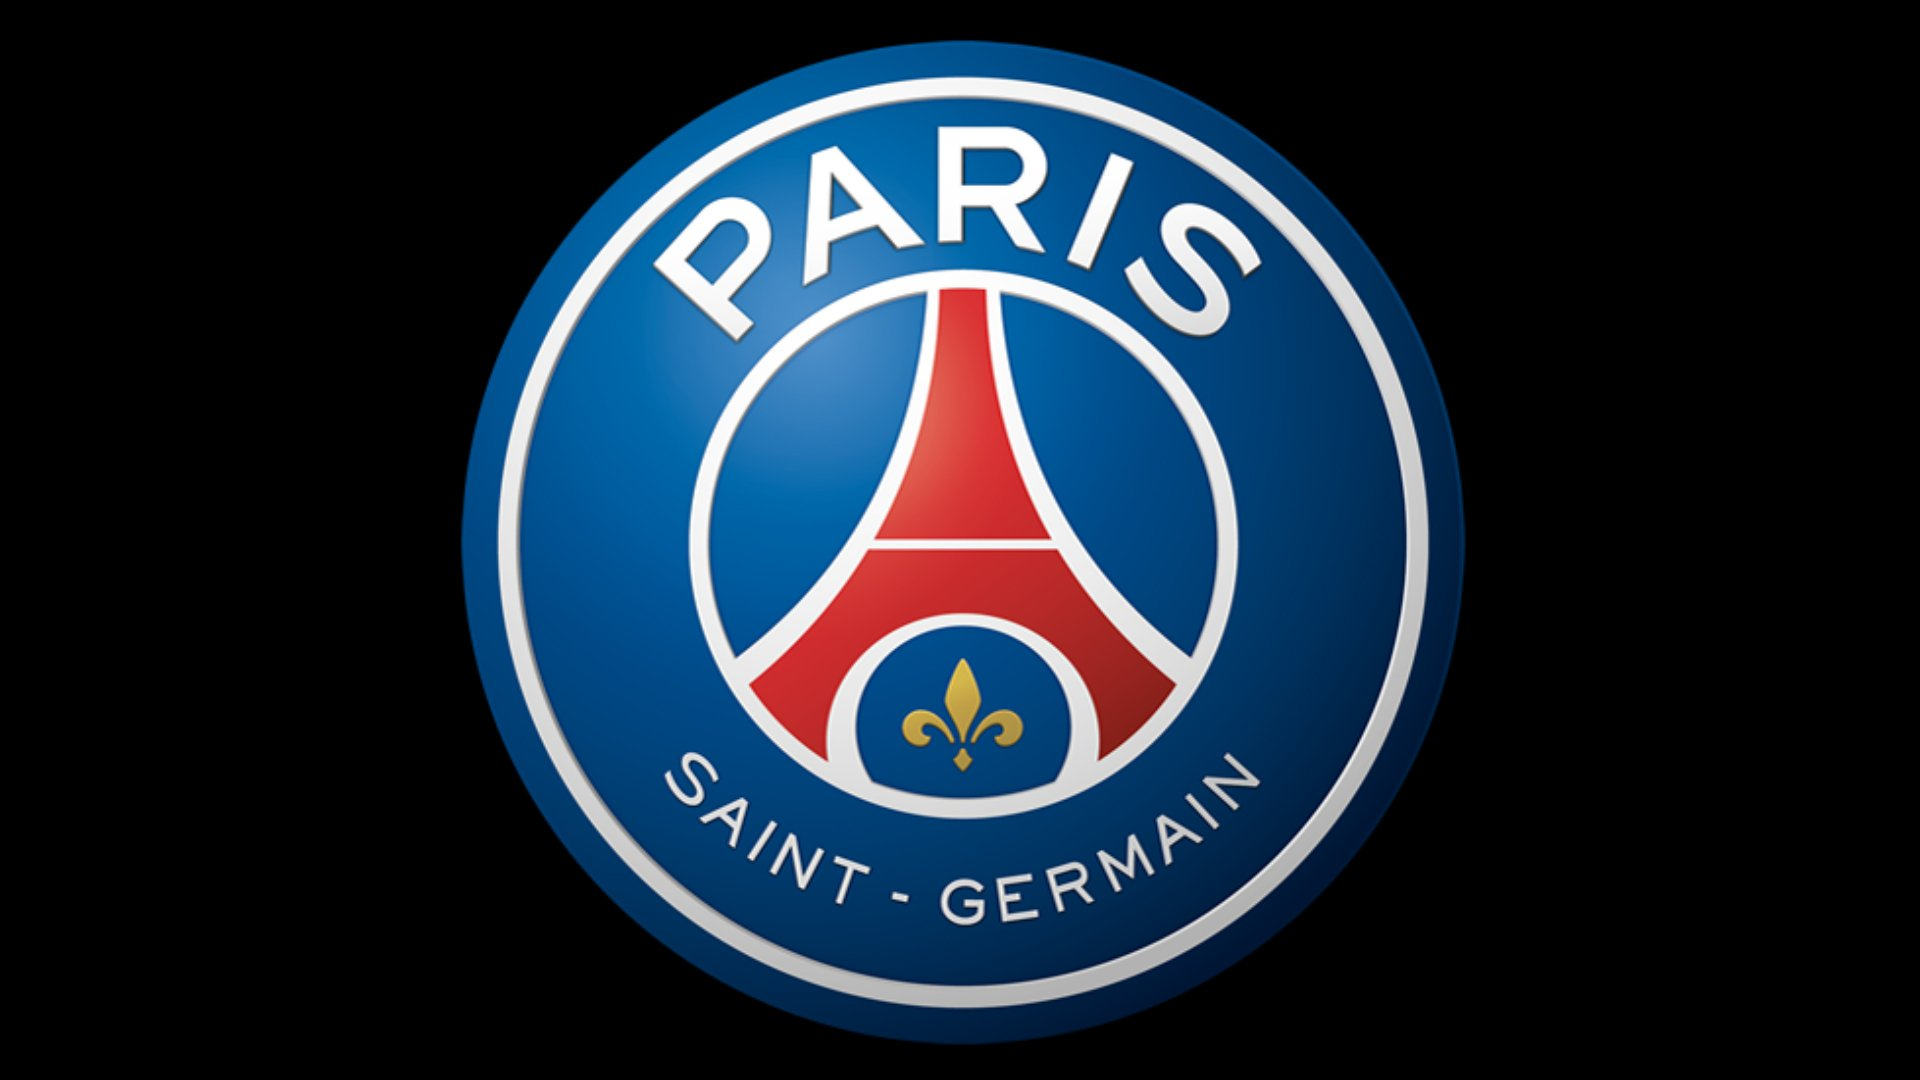 PSG Logo, PSG Symbol, Meaning, History and Evolution